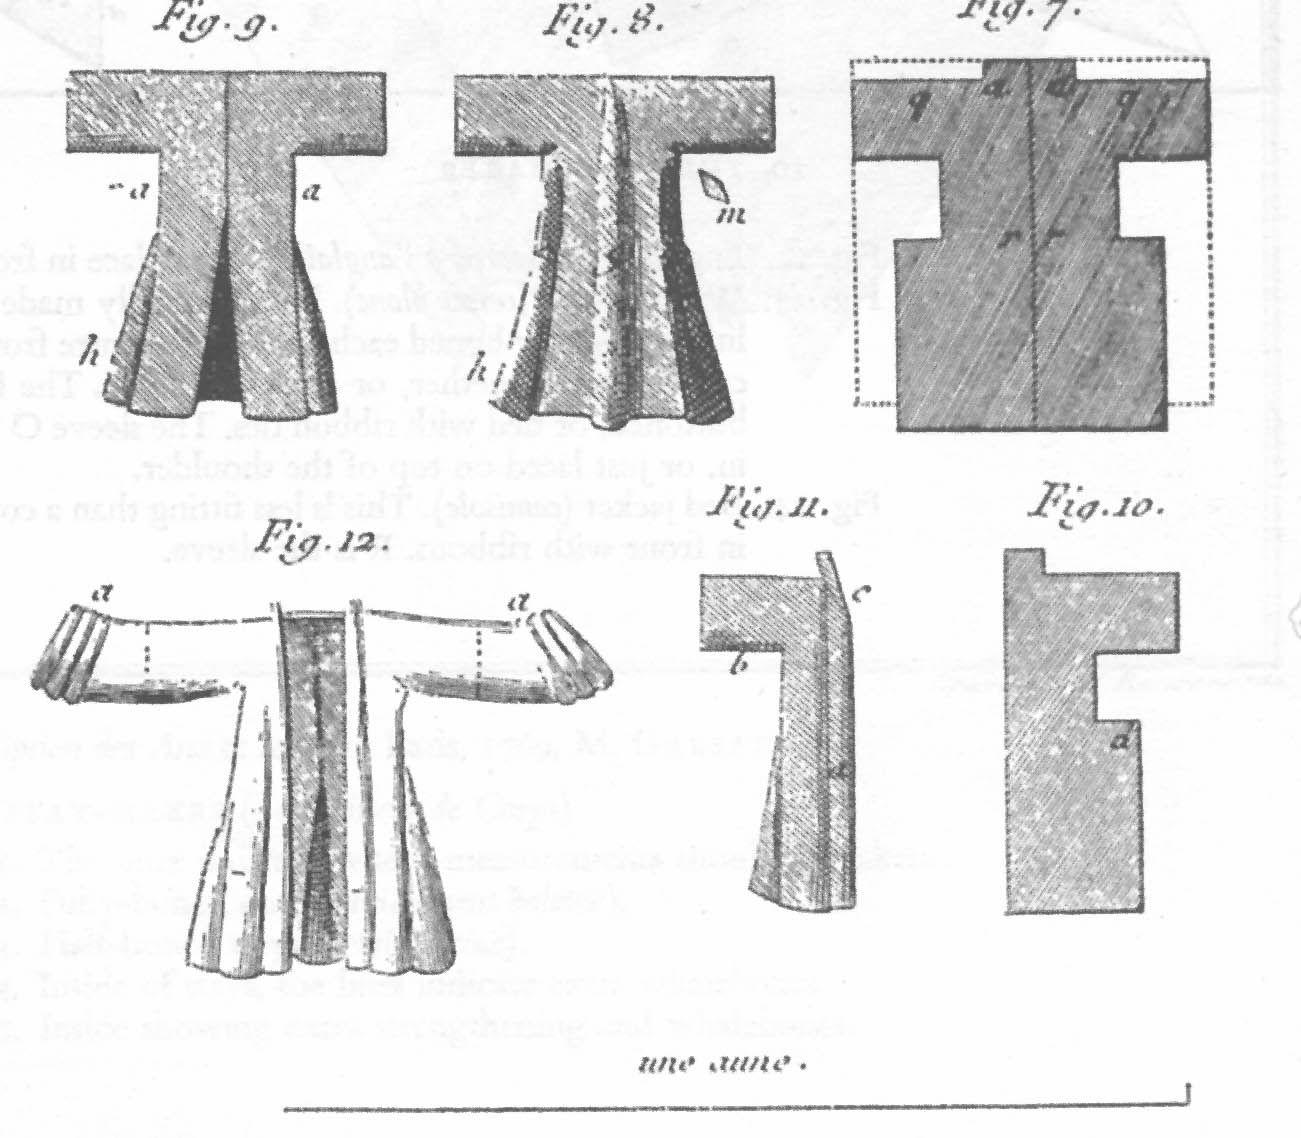 shortgown 18th century - Cerca con Google | 18th century shortgowns ...